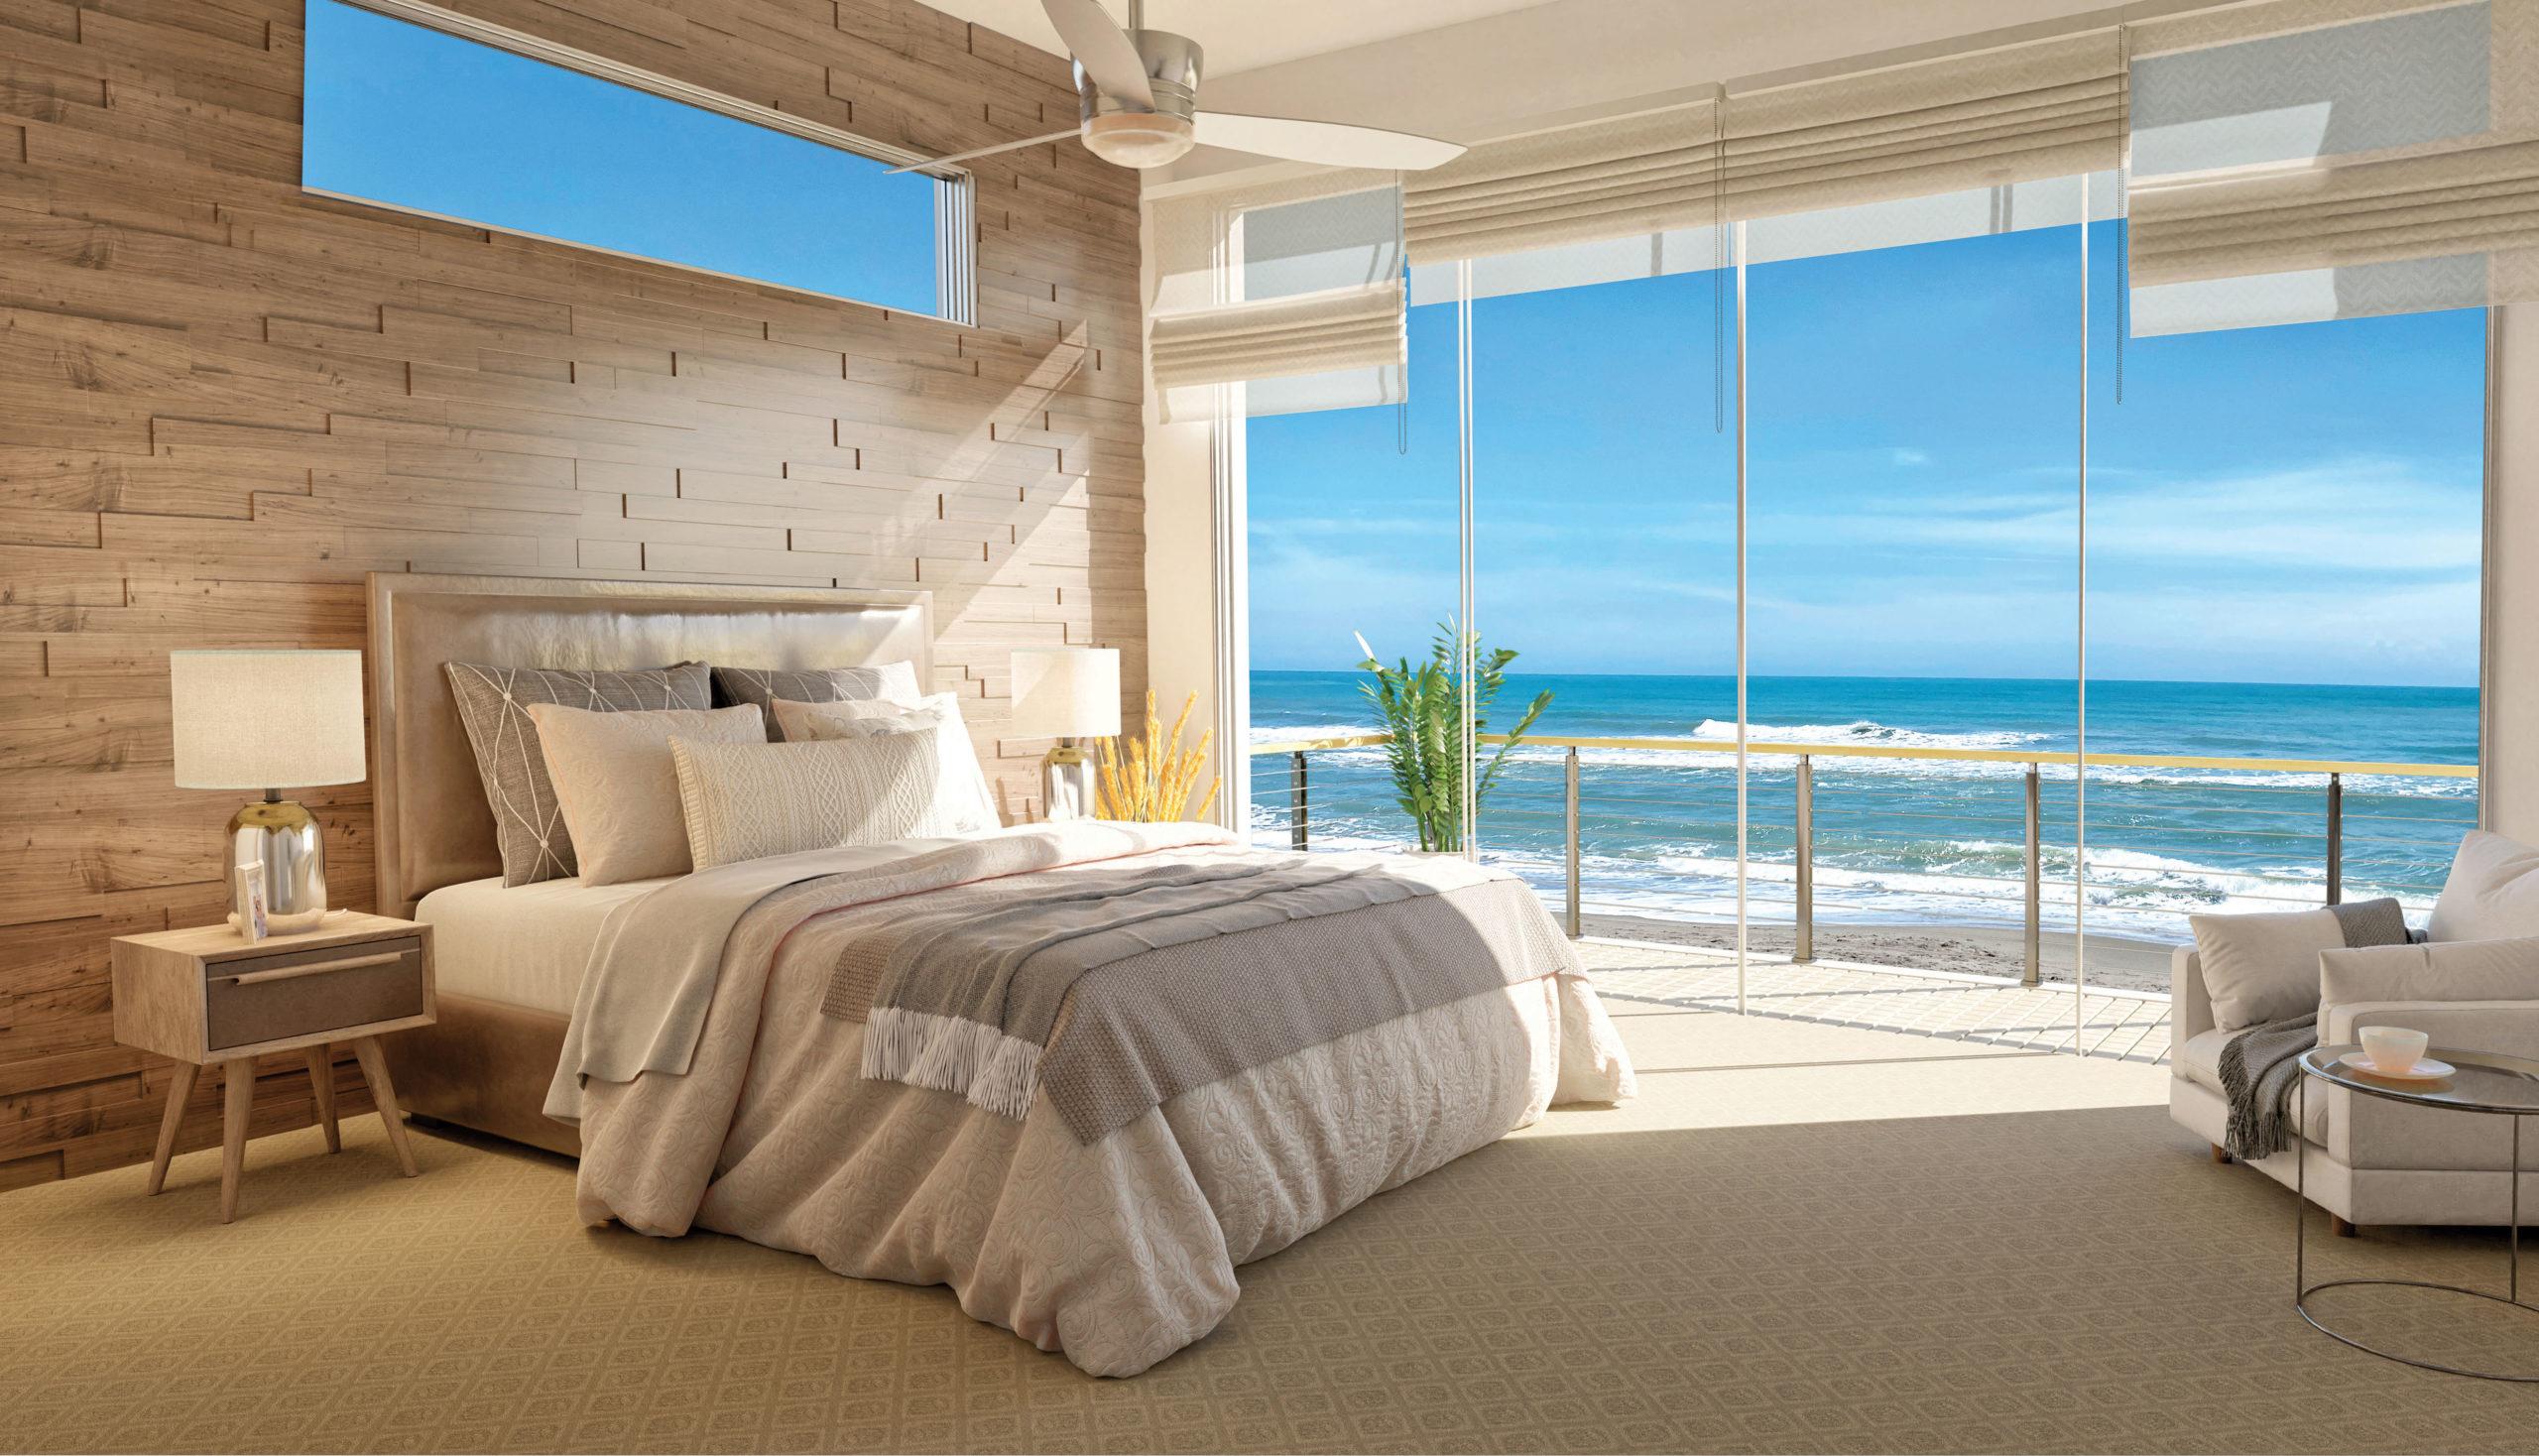 Harbor Island Beach Club Ocean Home Master Bedroom